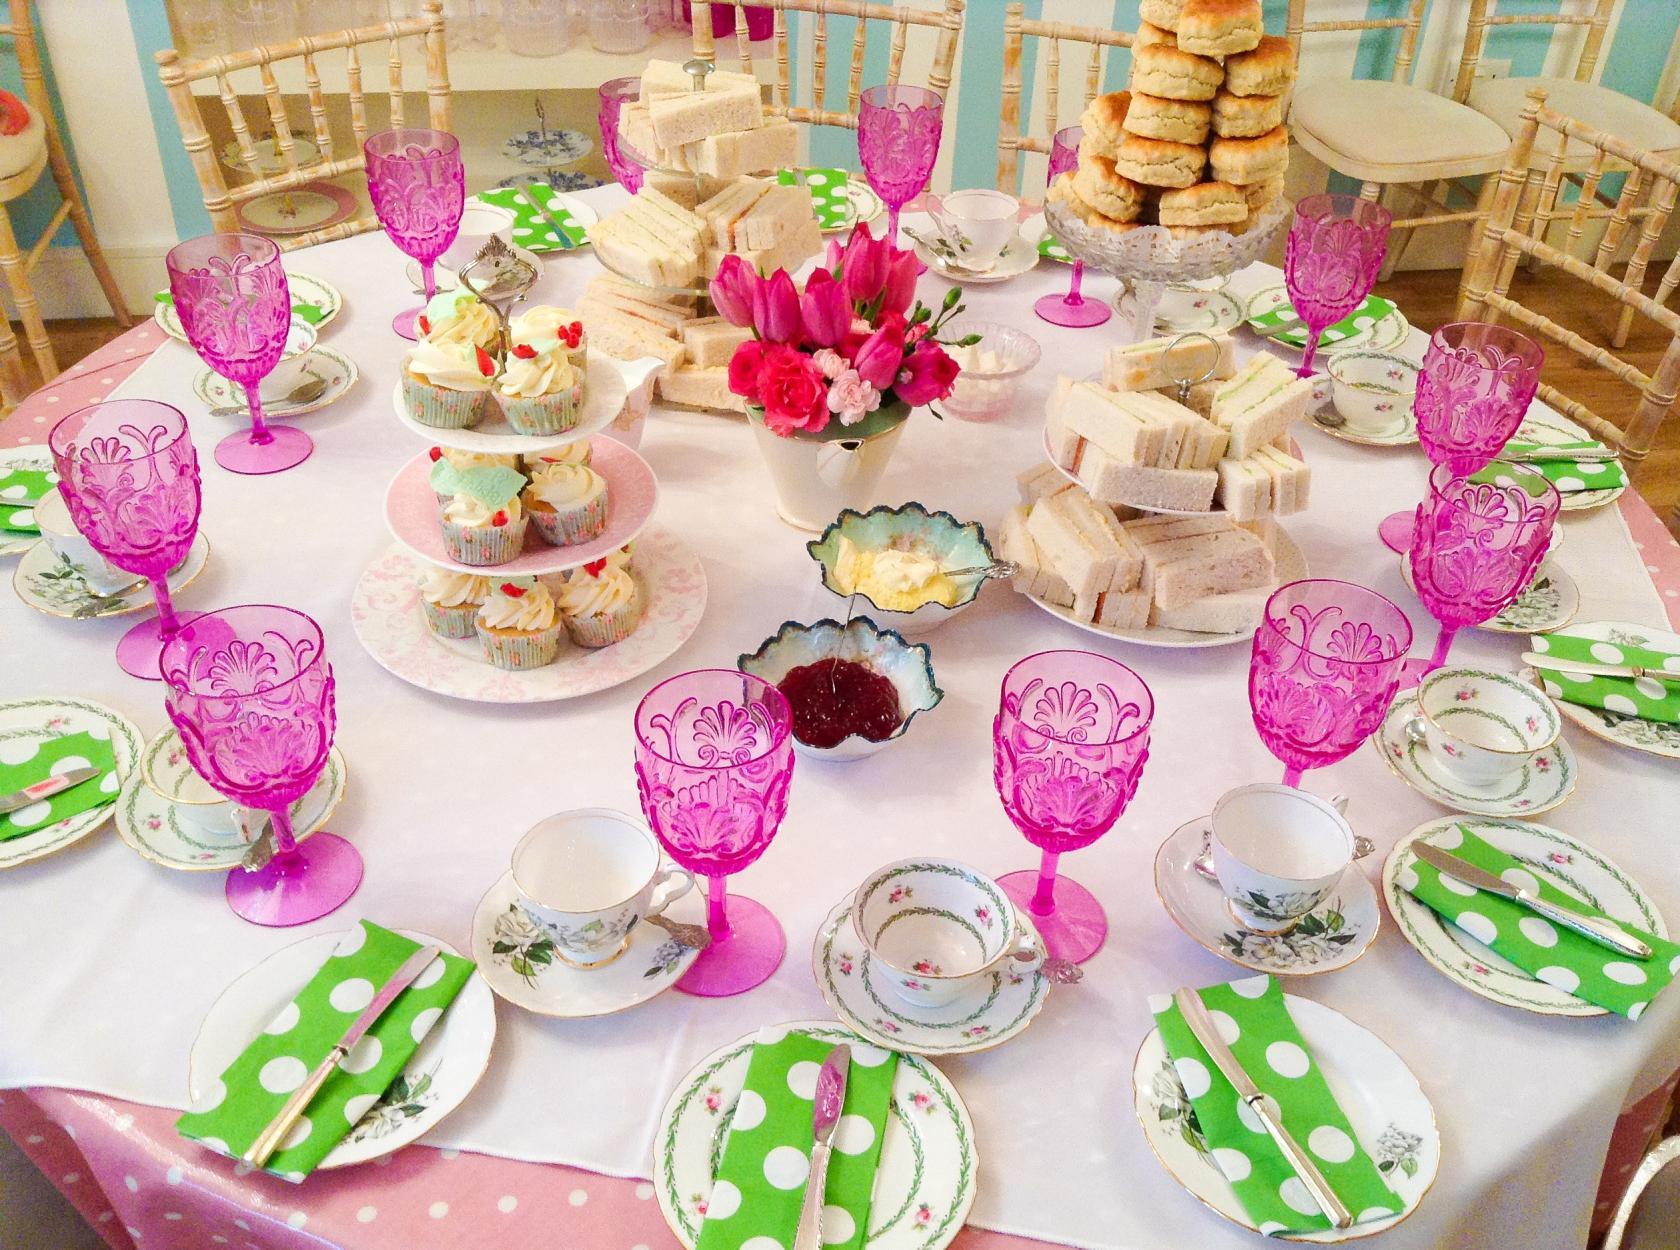 Teaparty: Best Tea Party Venues In London